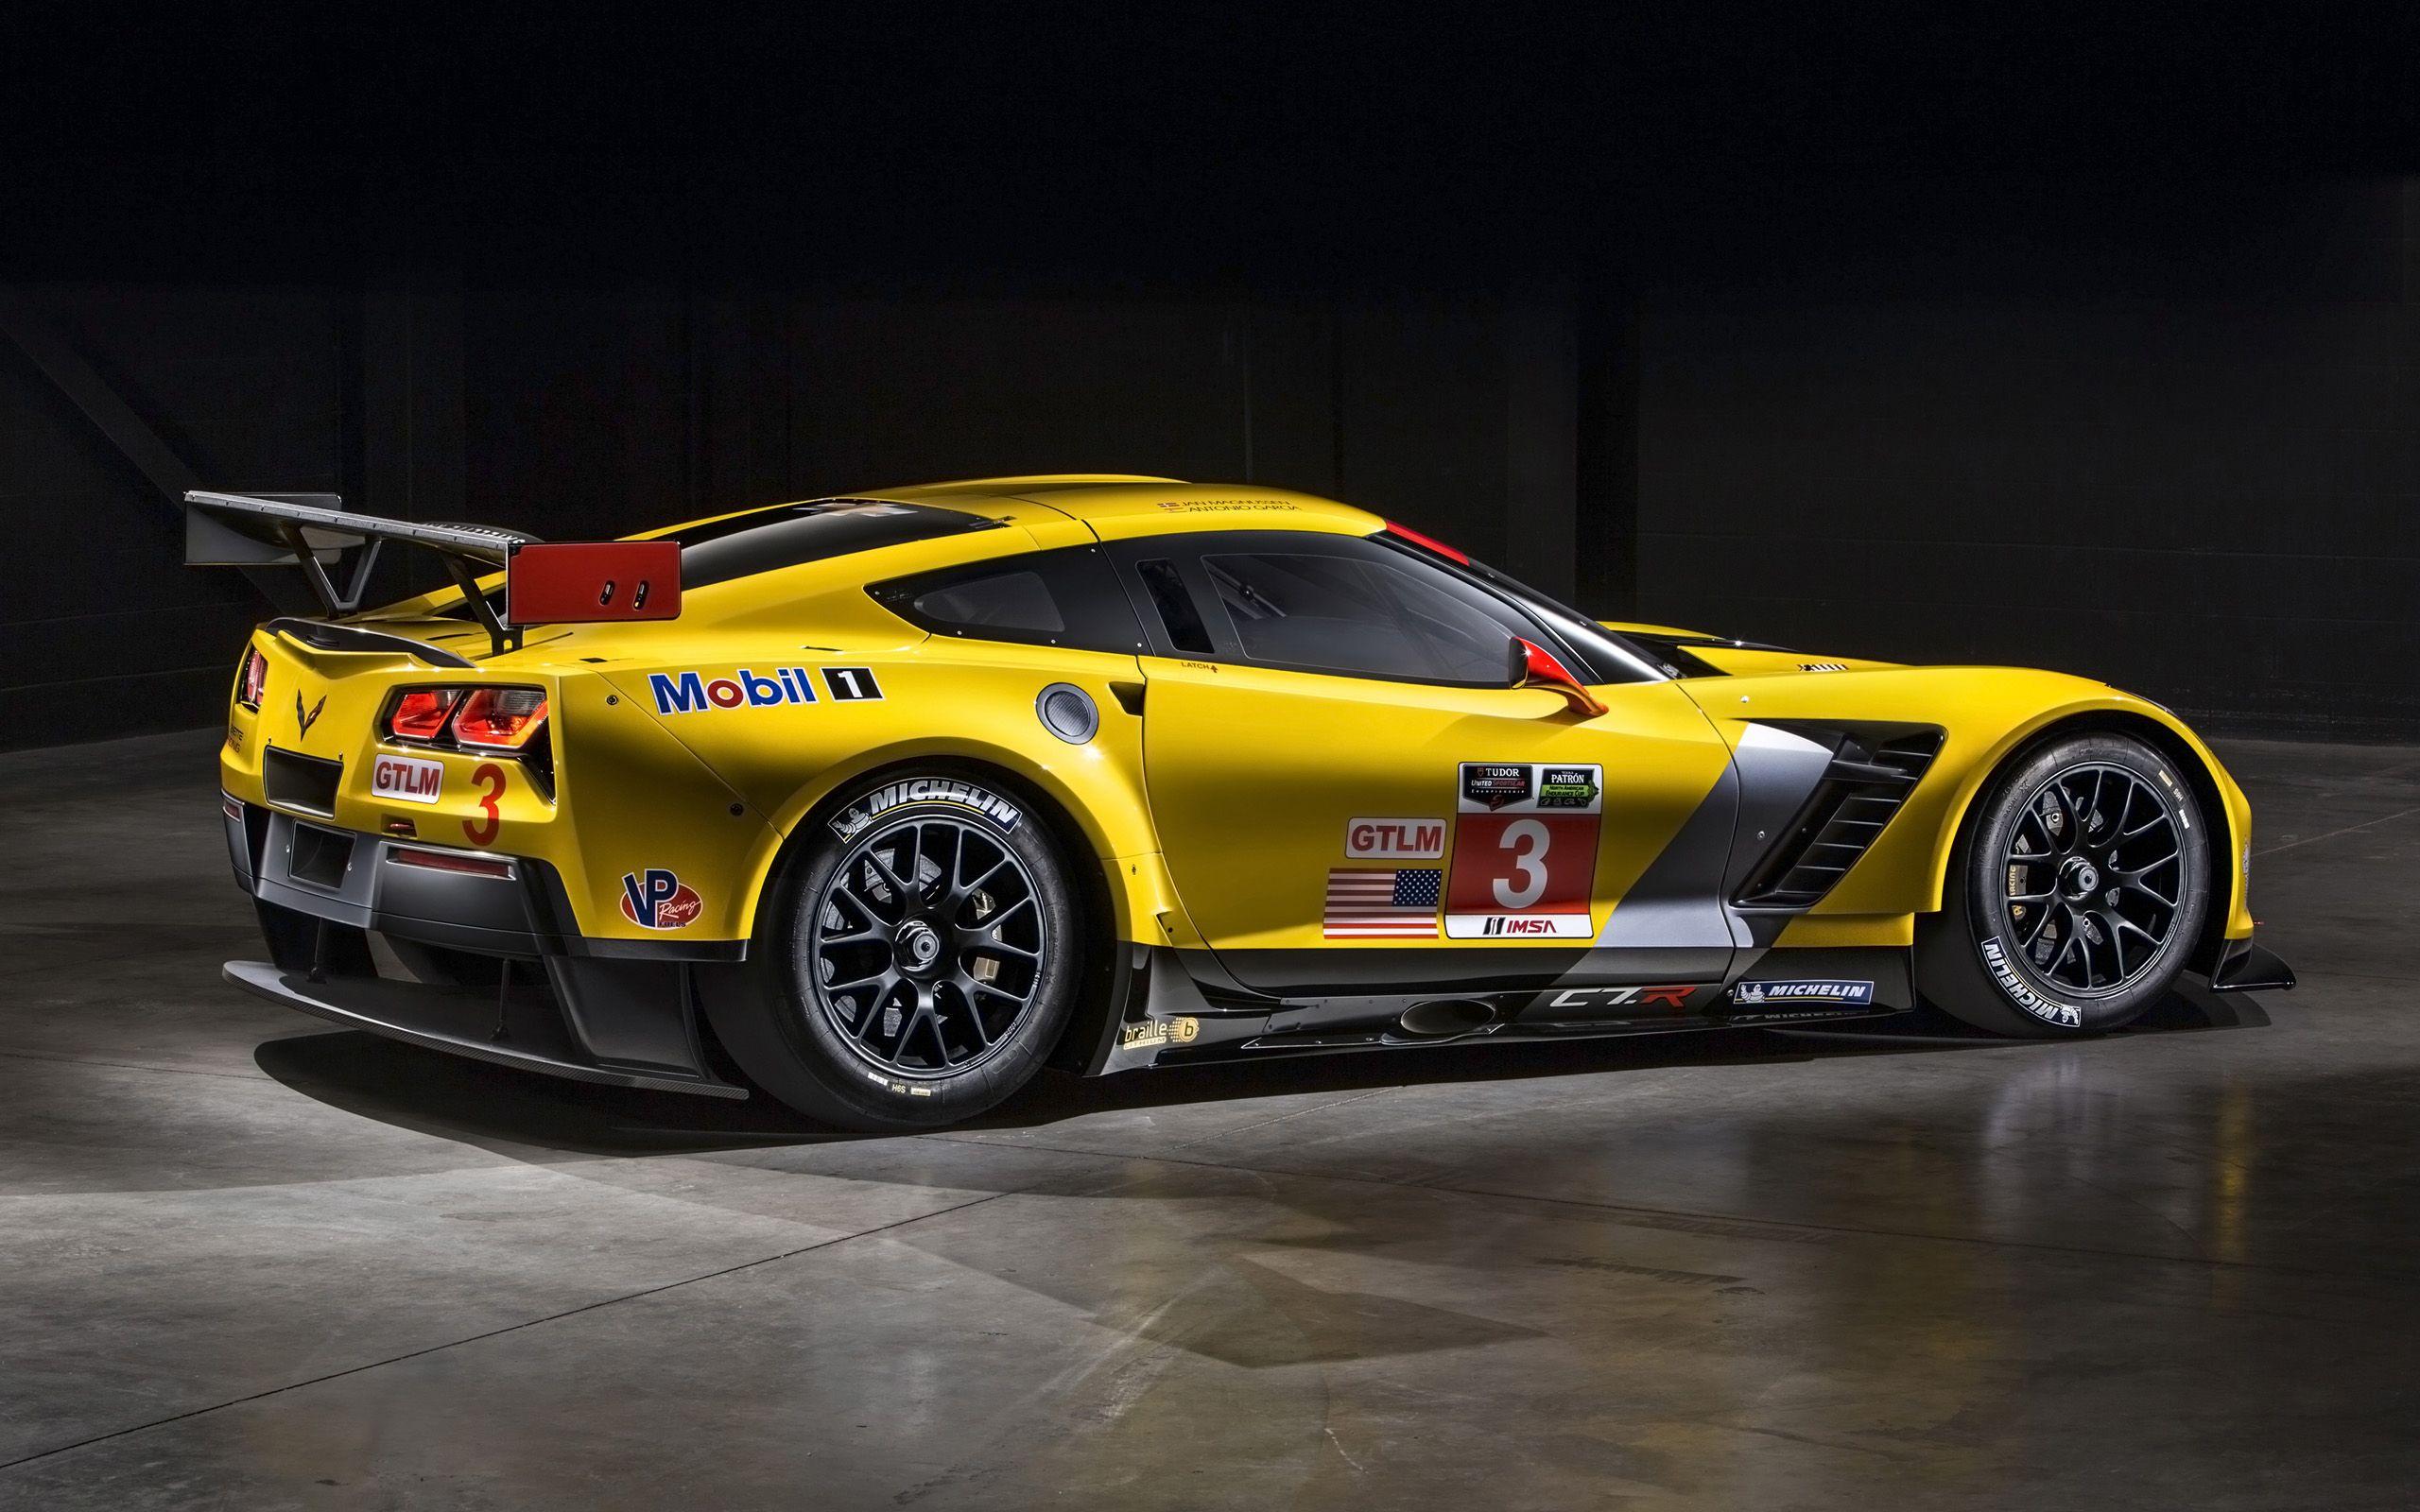 2015 Corvette Z06 Car Pictures - http://carwallspaper.com/2015 ...